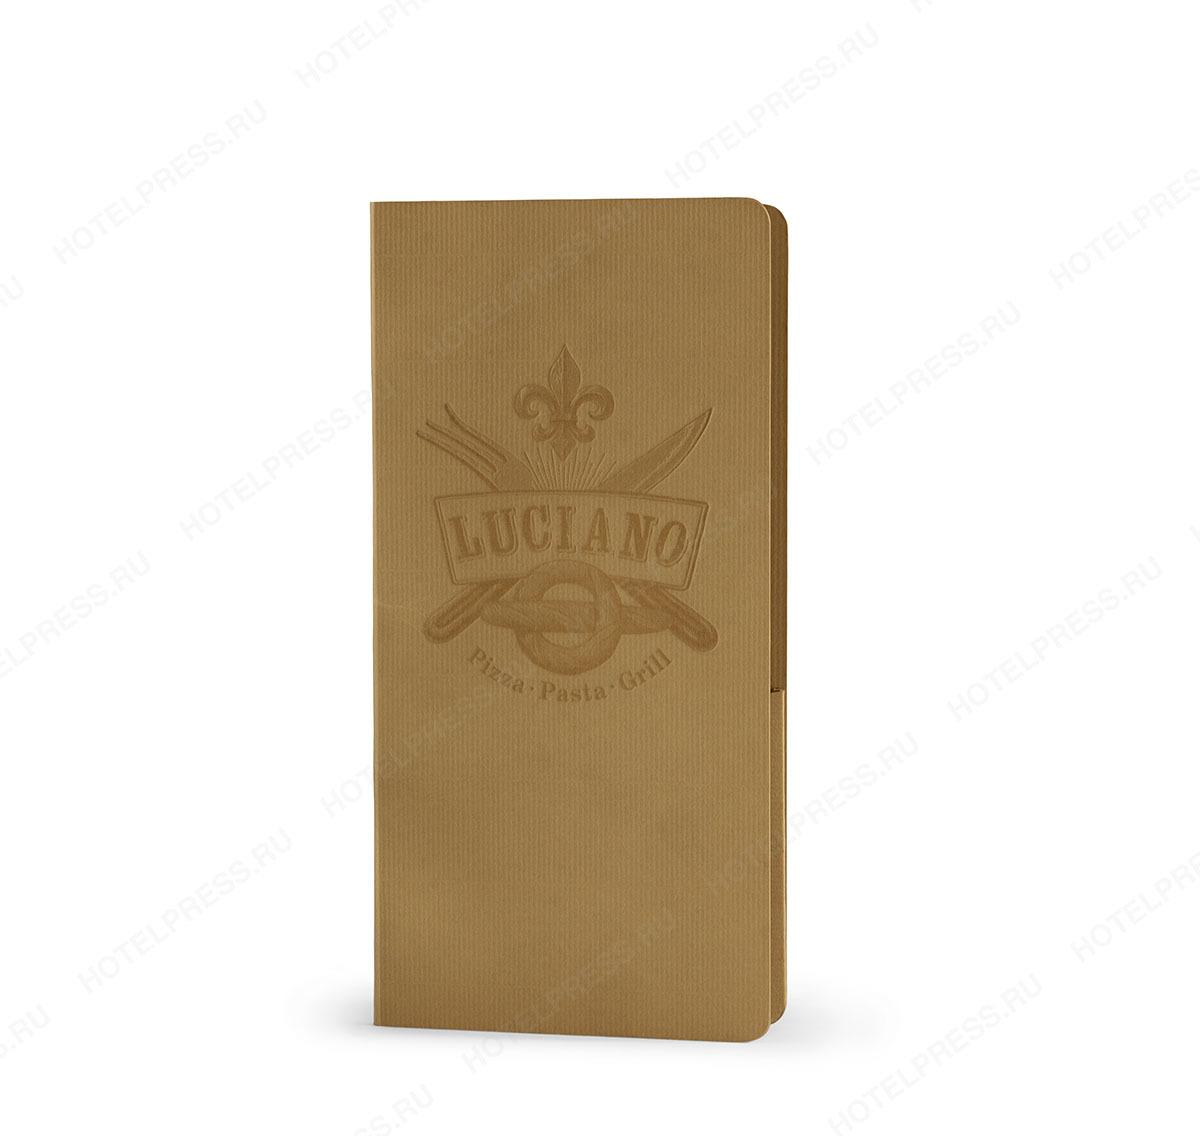 Счётница для ресторана Luciano